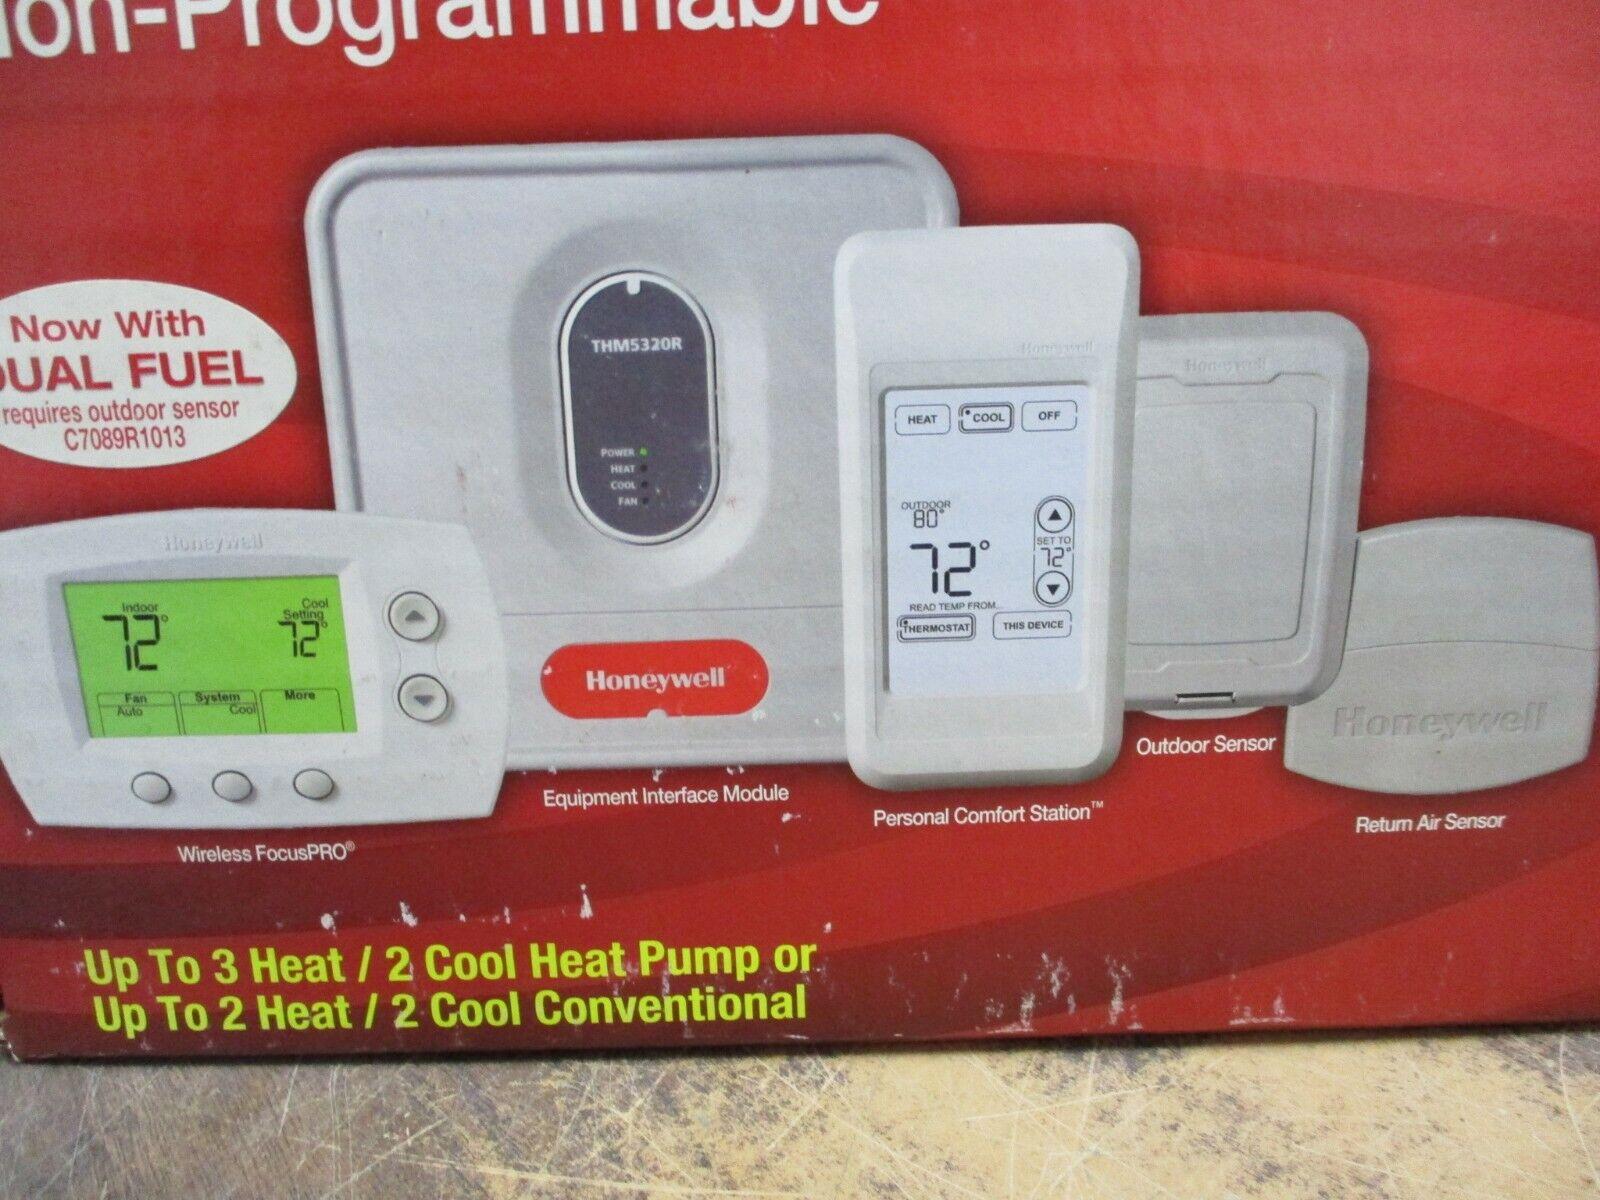 HONEYWELL YTH5320R1000 non programmabile termostato wireless KIT SISTEMA 193521